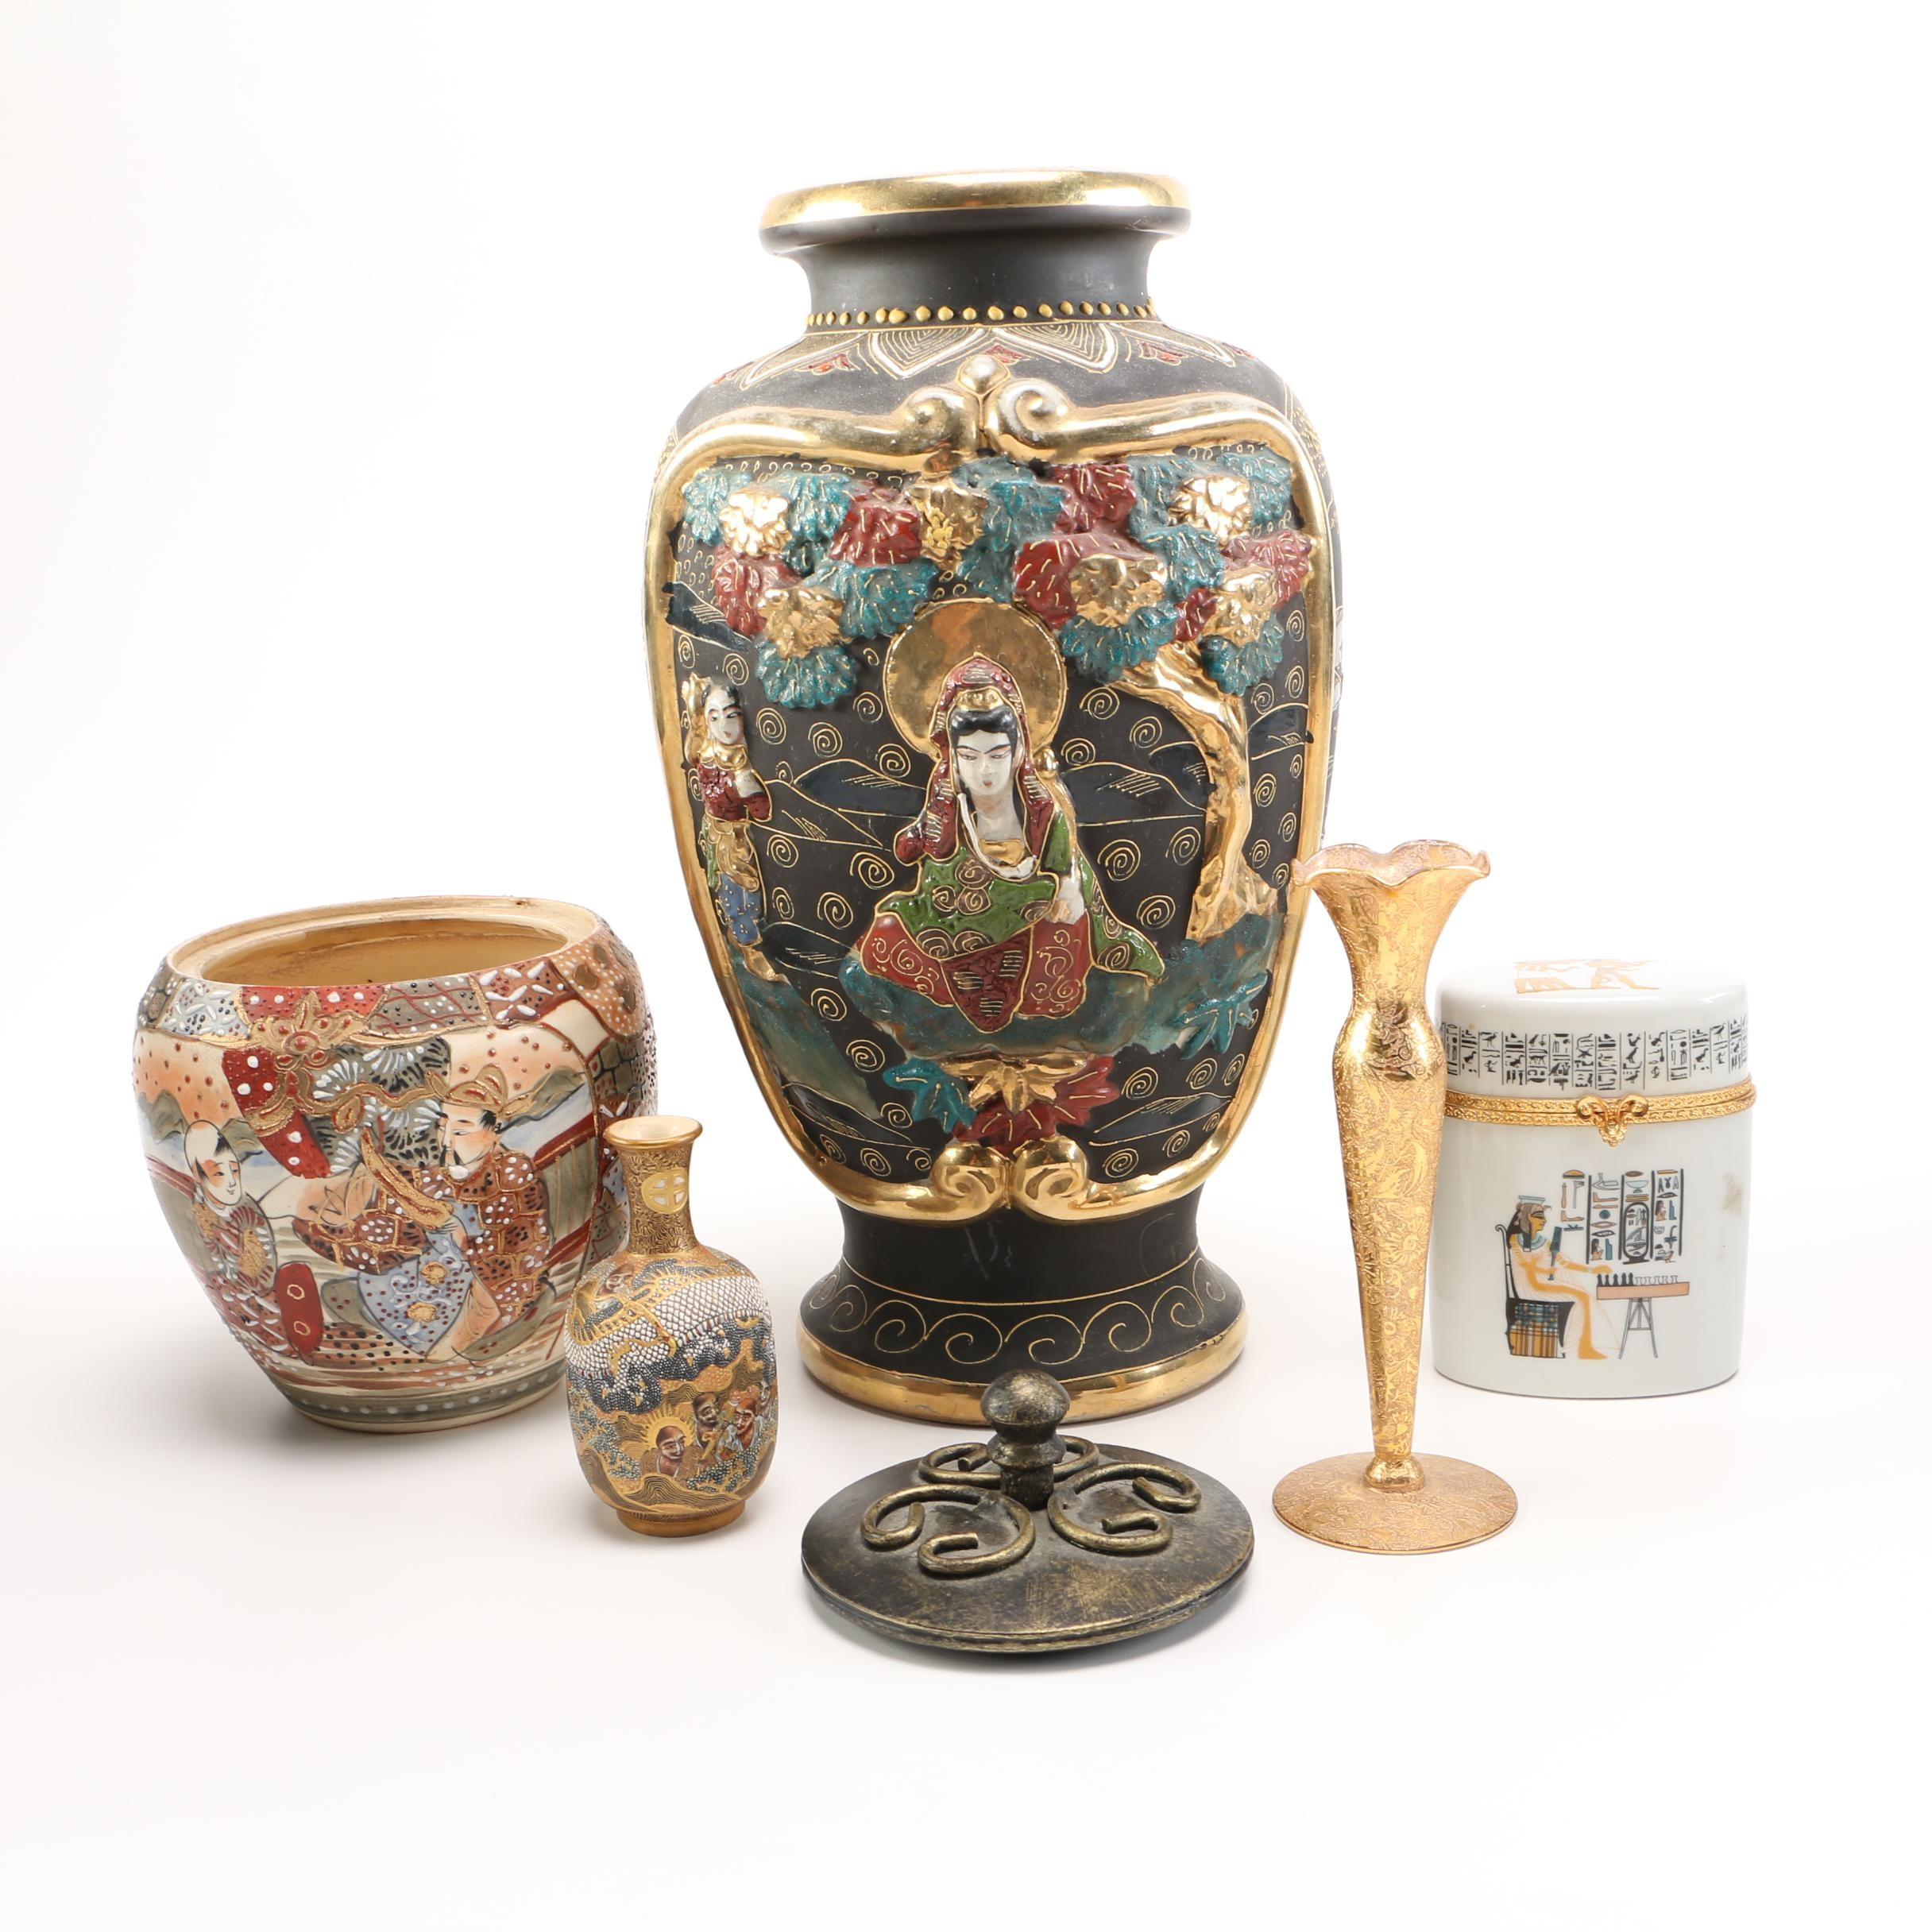 Decorative Vases With Gold Tone Detailing Featuring Bernardaud